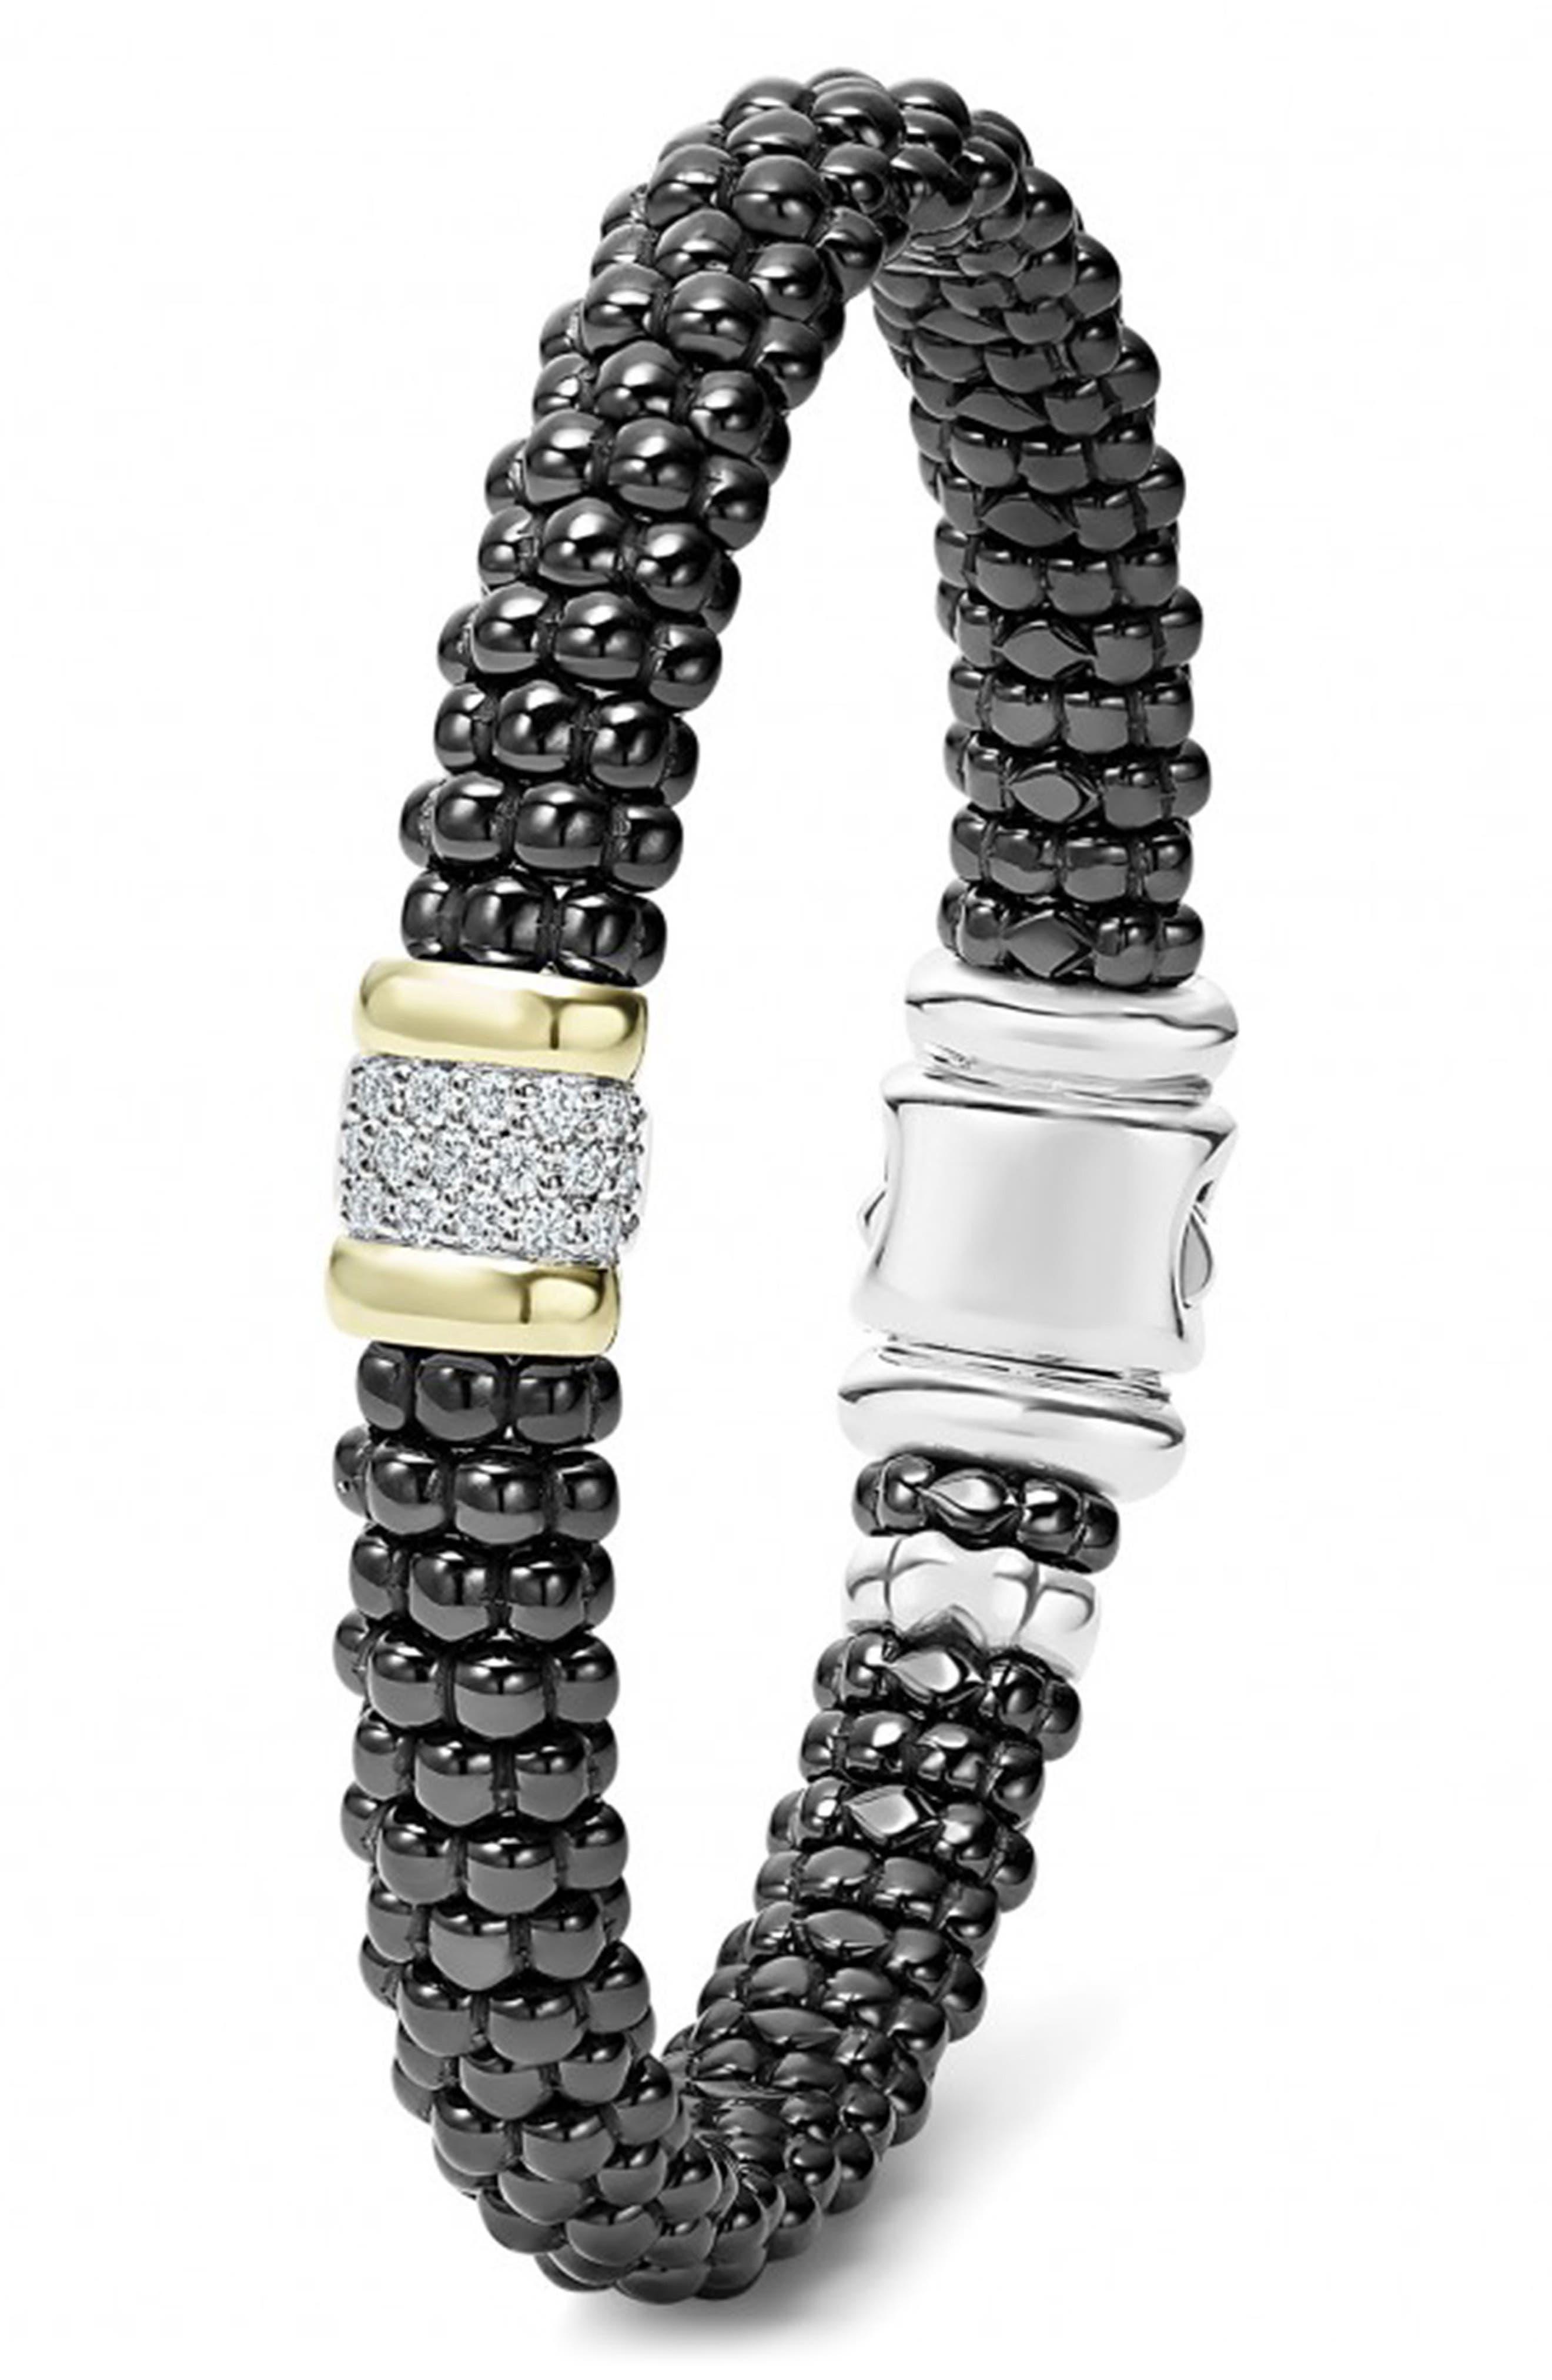 'Black Caviar' Diamond Rope Bracelet,                             Alternate thumbnail 4, color,                             BLACK CAVIAR/ GOLD